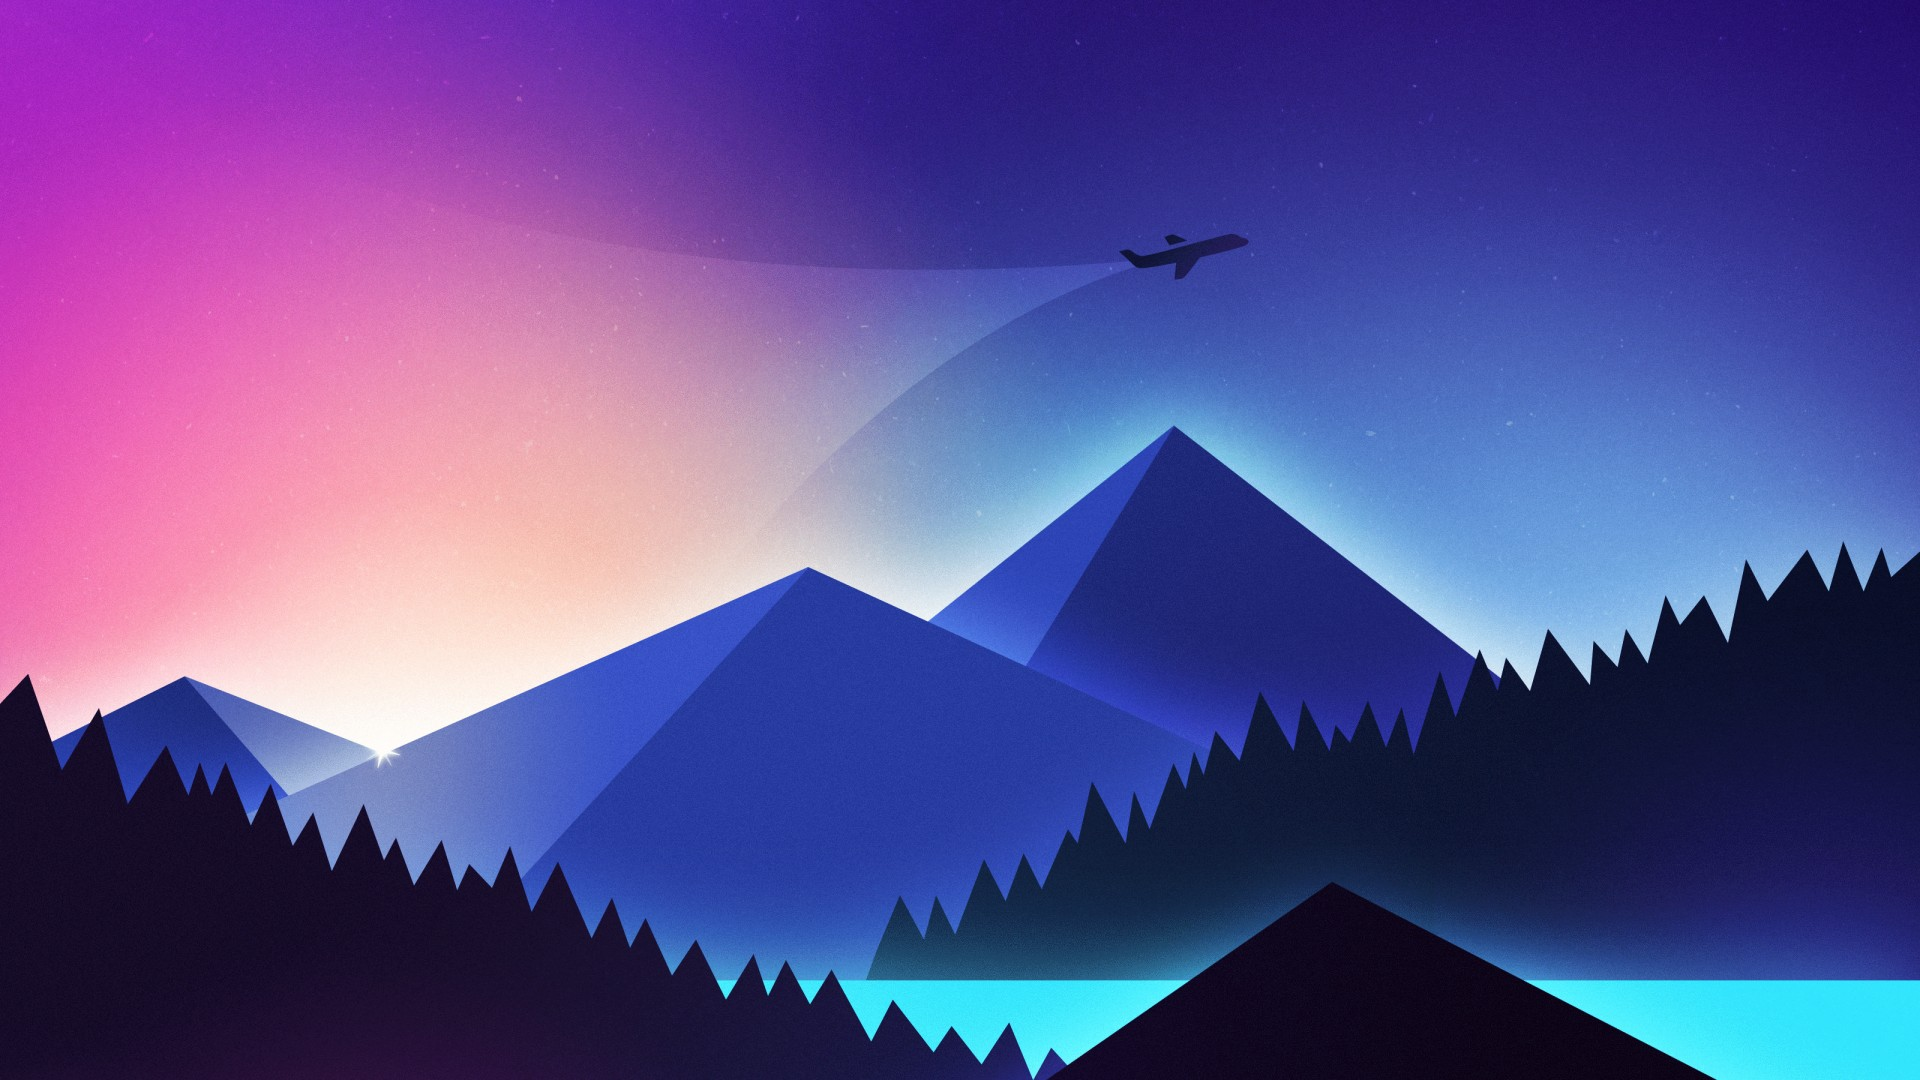 Wallpaper Plane, minimalism, colors, 4K, Art #18613